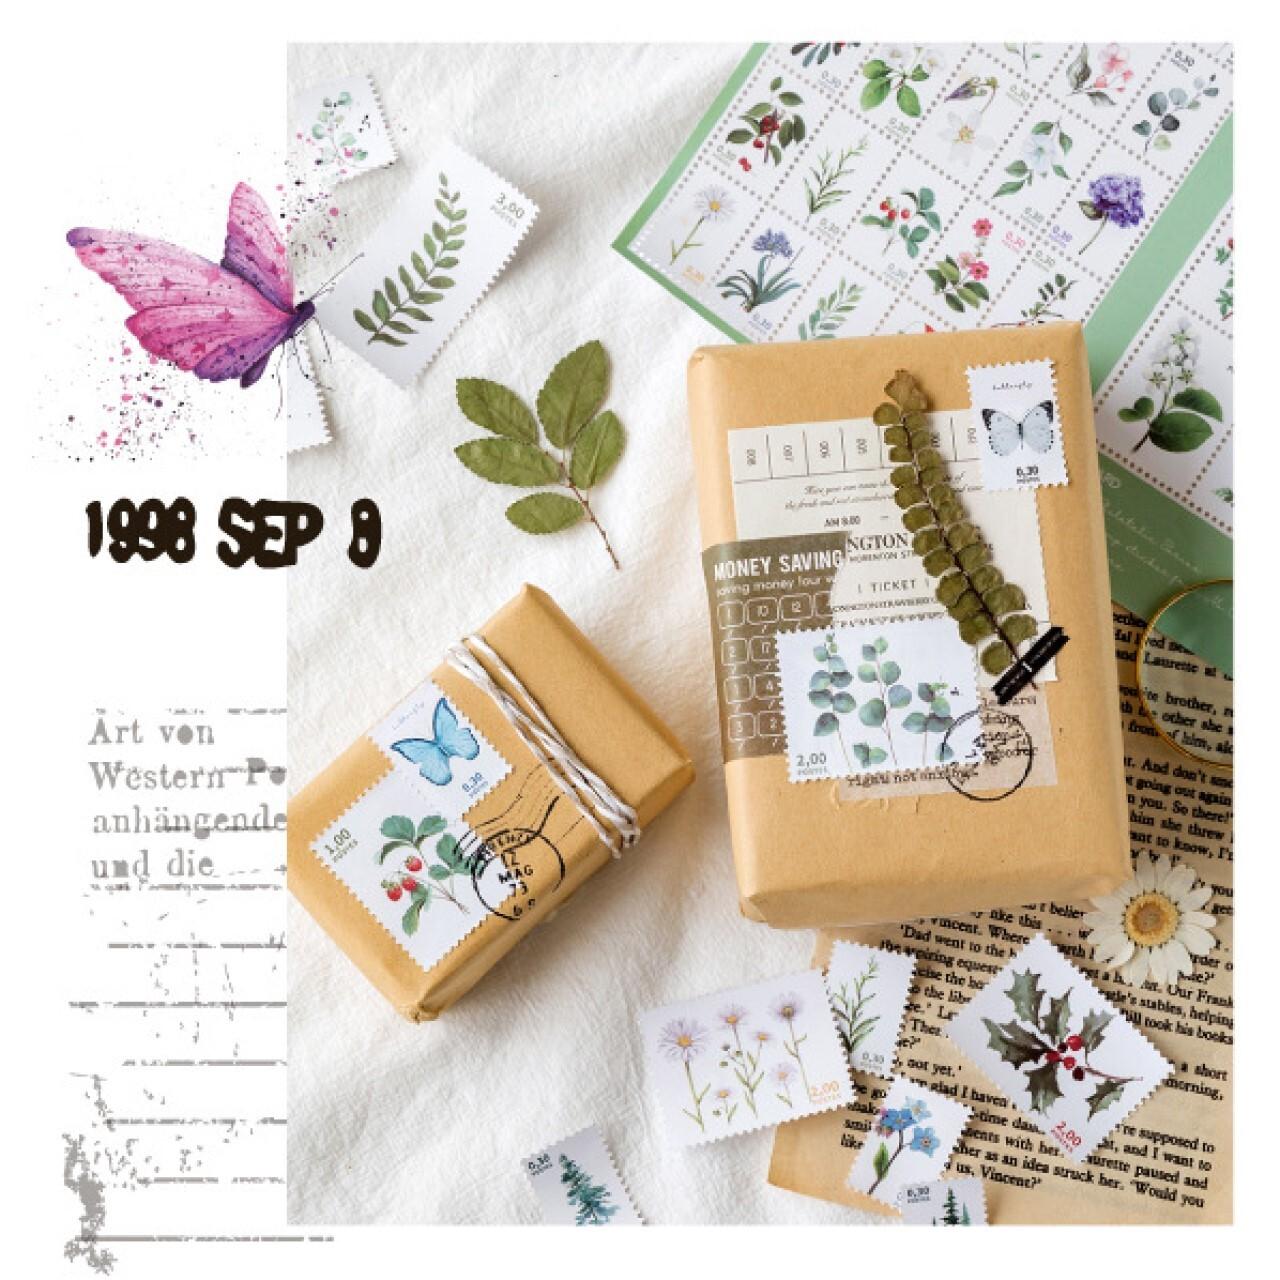 D17 切手モチーフ ステッカー 全8種 スタンプ シール 植物 野鳥 蝶 ボタニカル きのこ コラージュ ジャンクナーナル